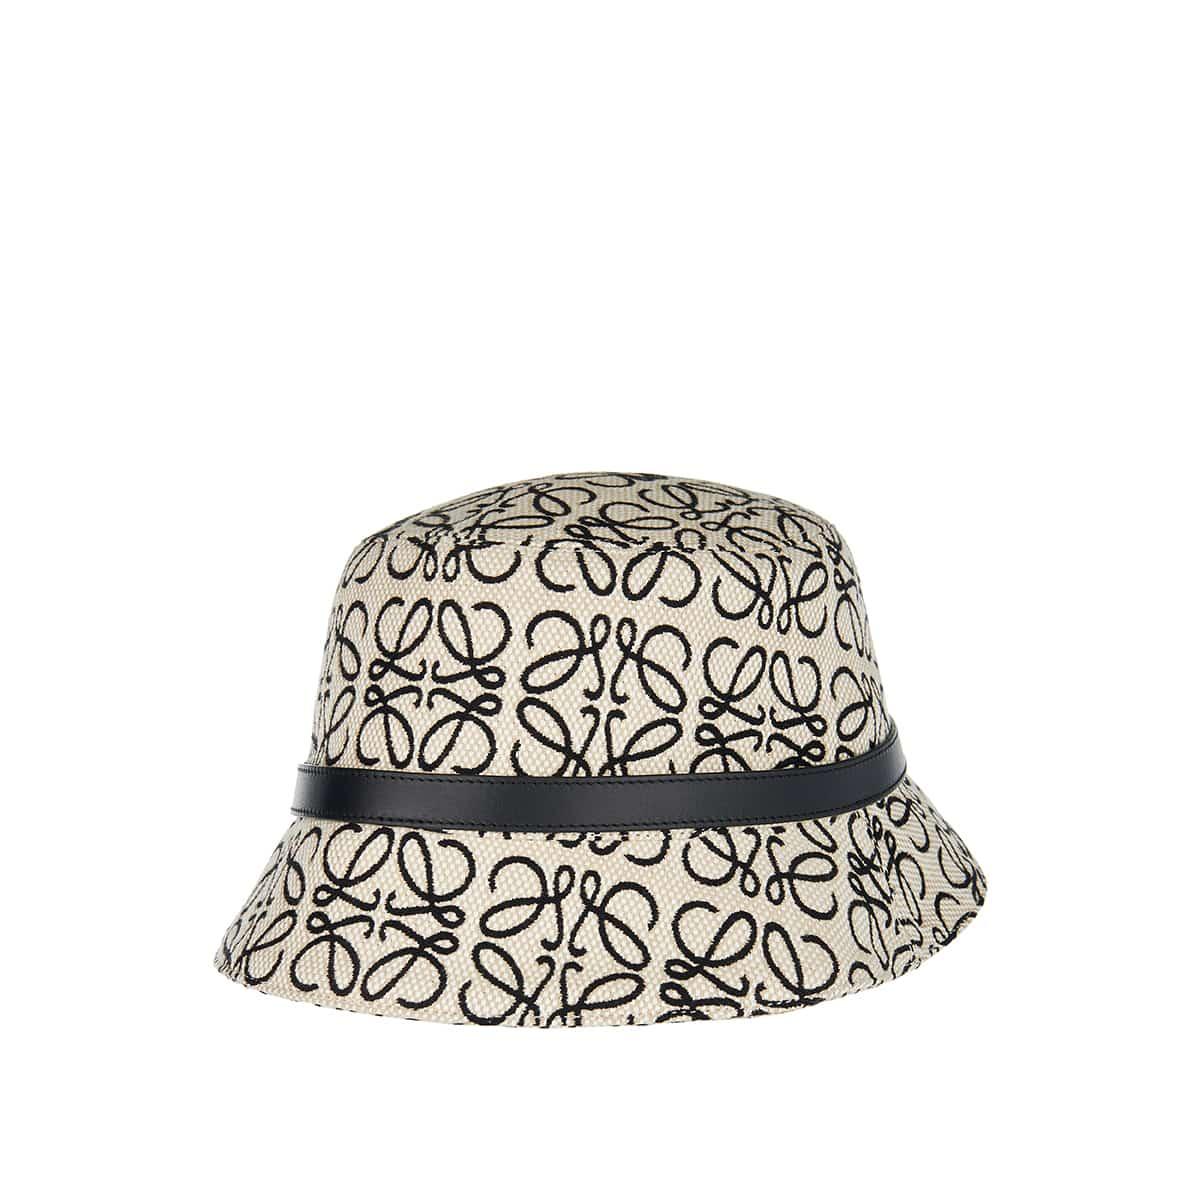 Anagram jacquard bucket hat